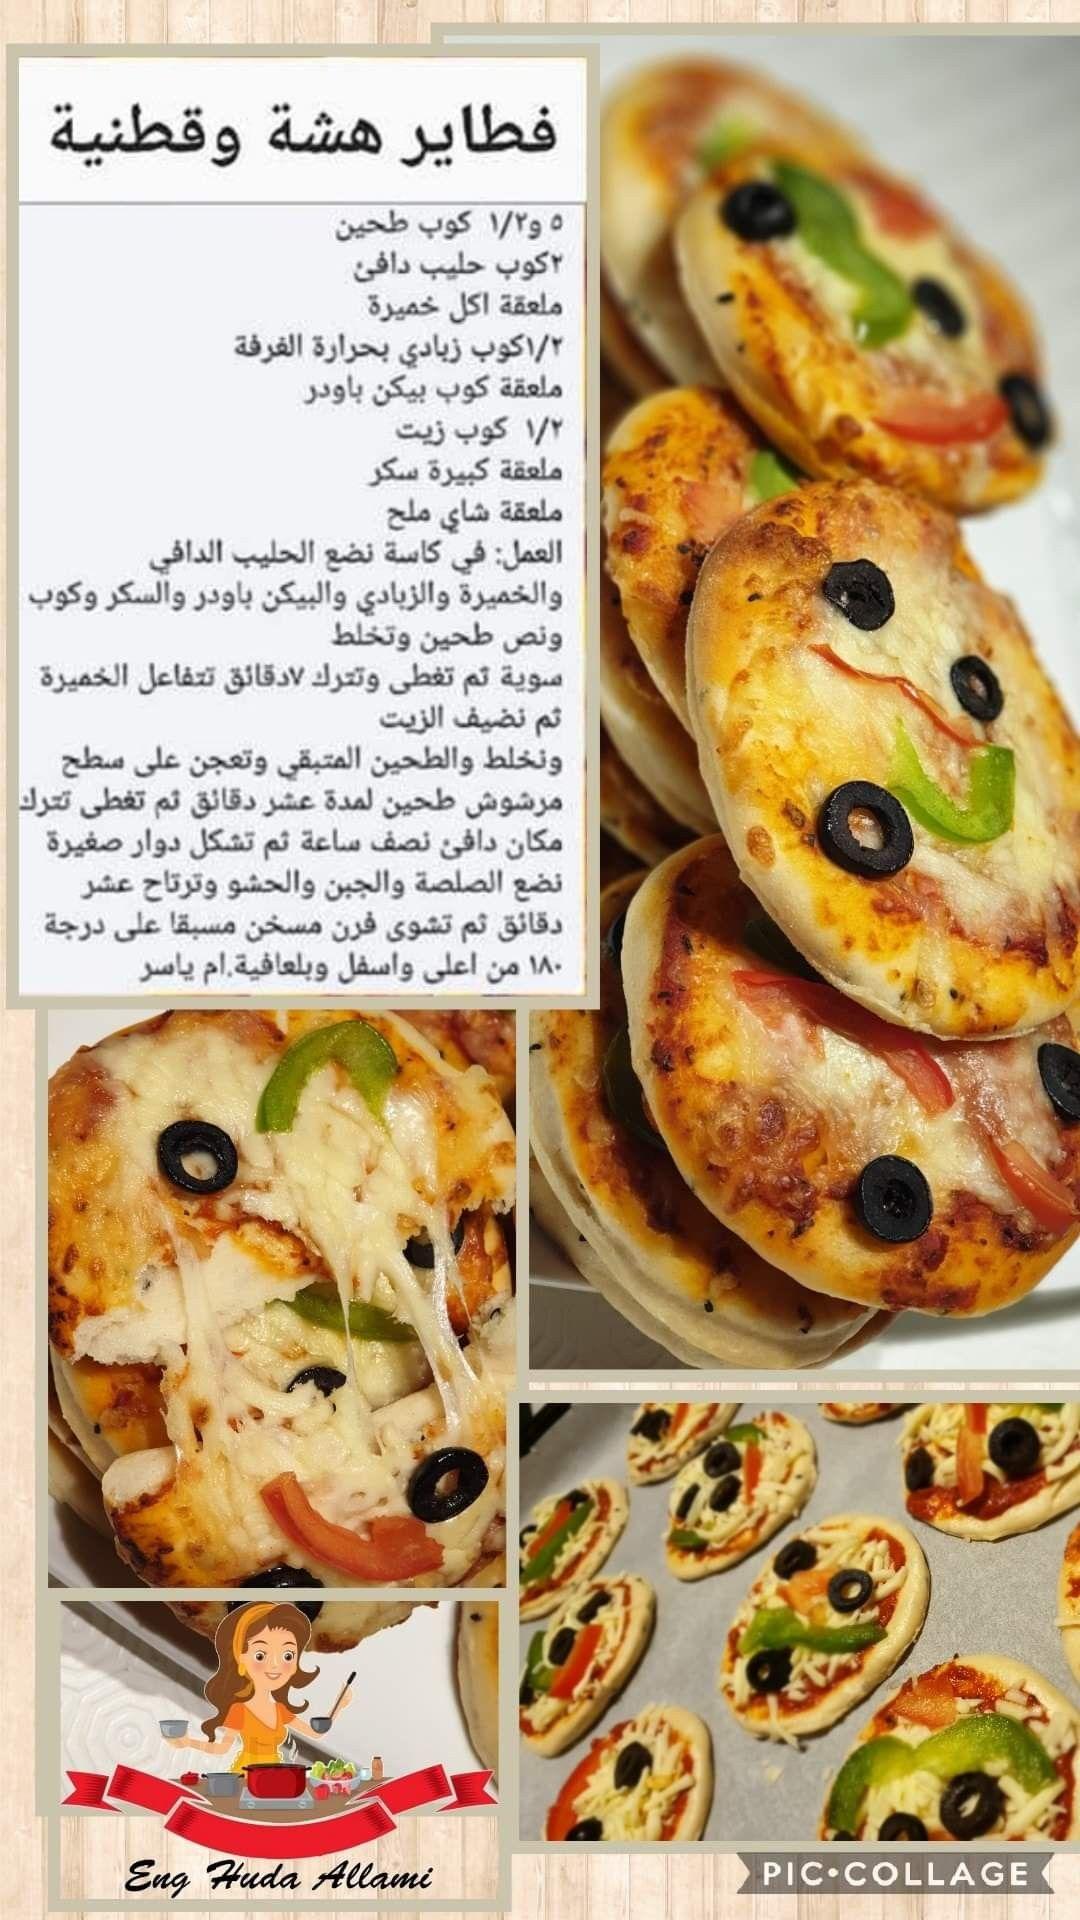 Pin By Rose Ahmad On Ragad In 2021 Diy Food Recipes Food Arabian Food